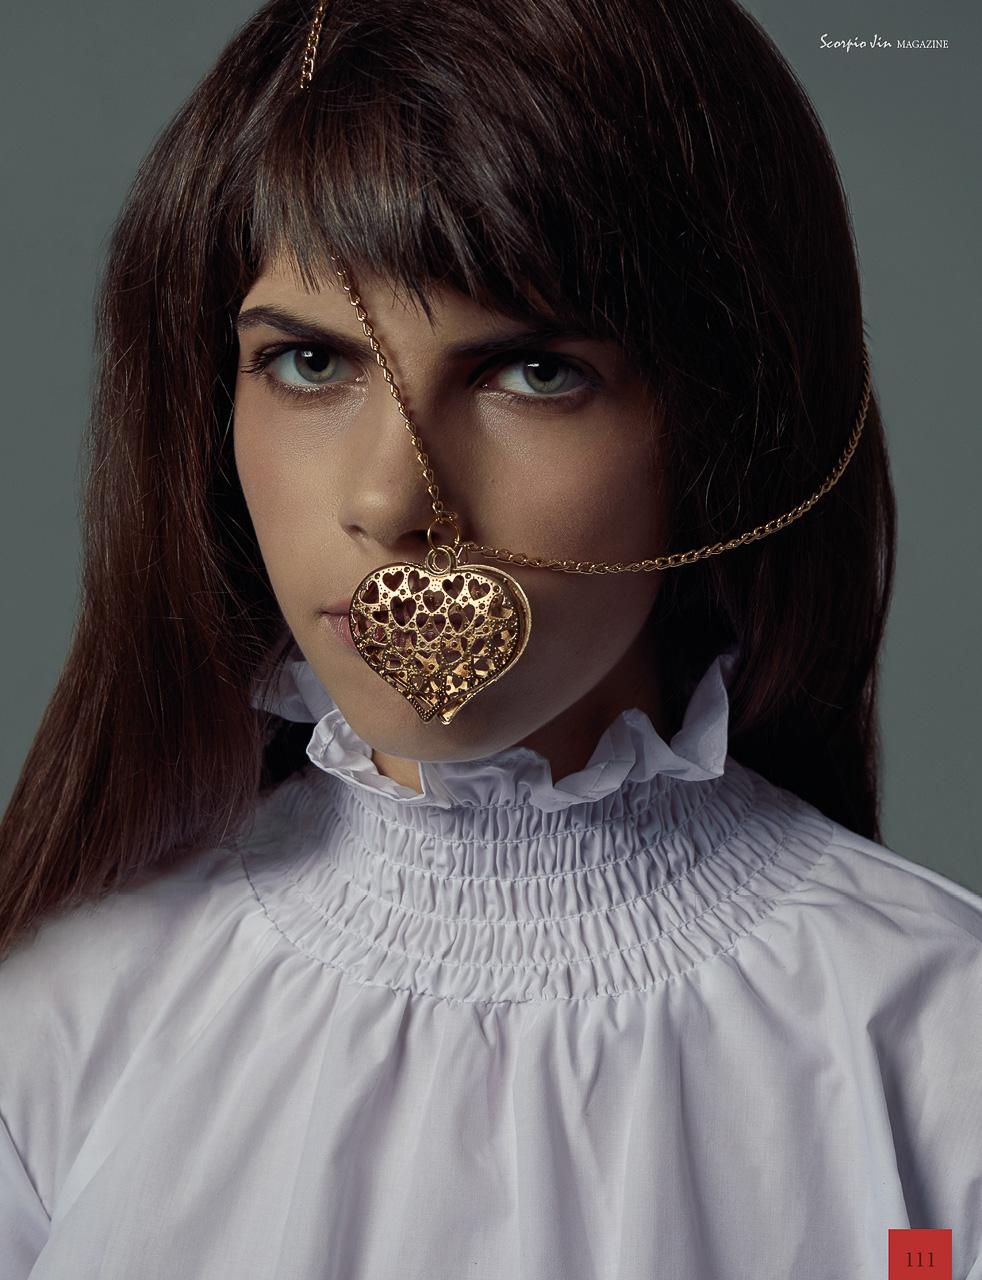 Beauty Fotoshooting München Fashion